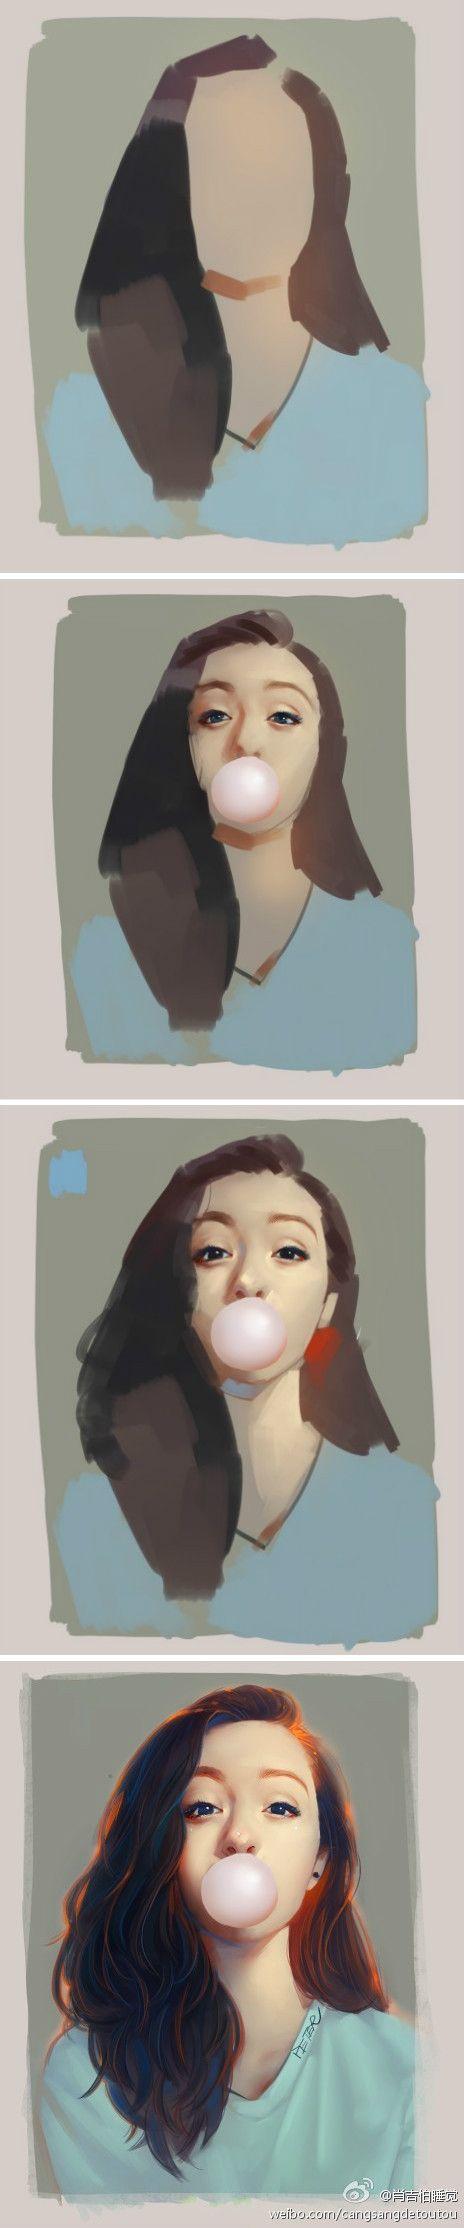 Art process. Drawing girl portrait.